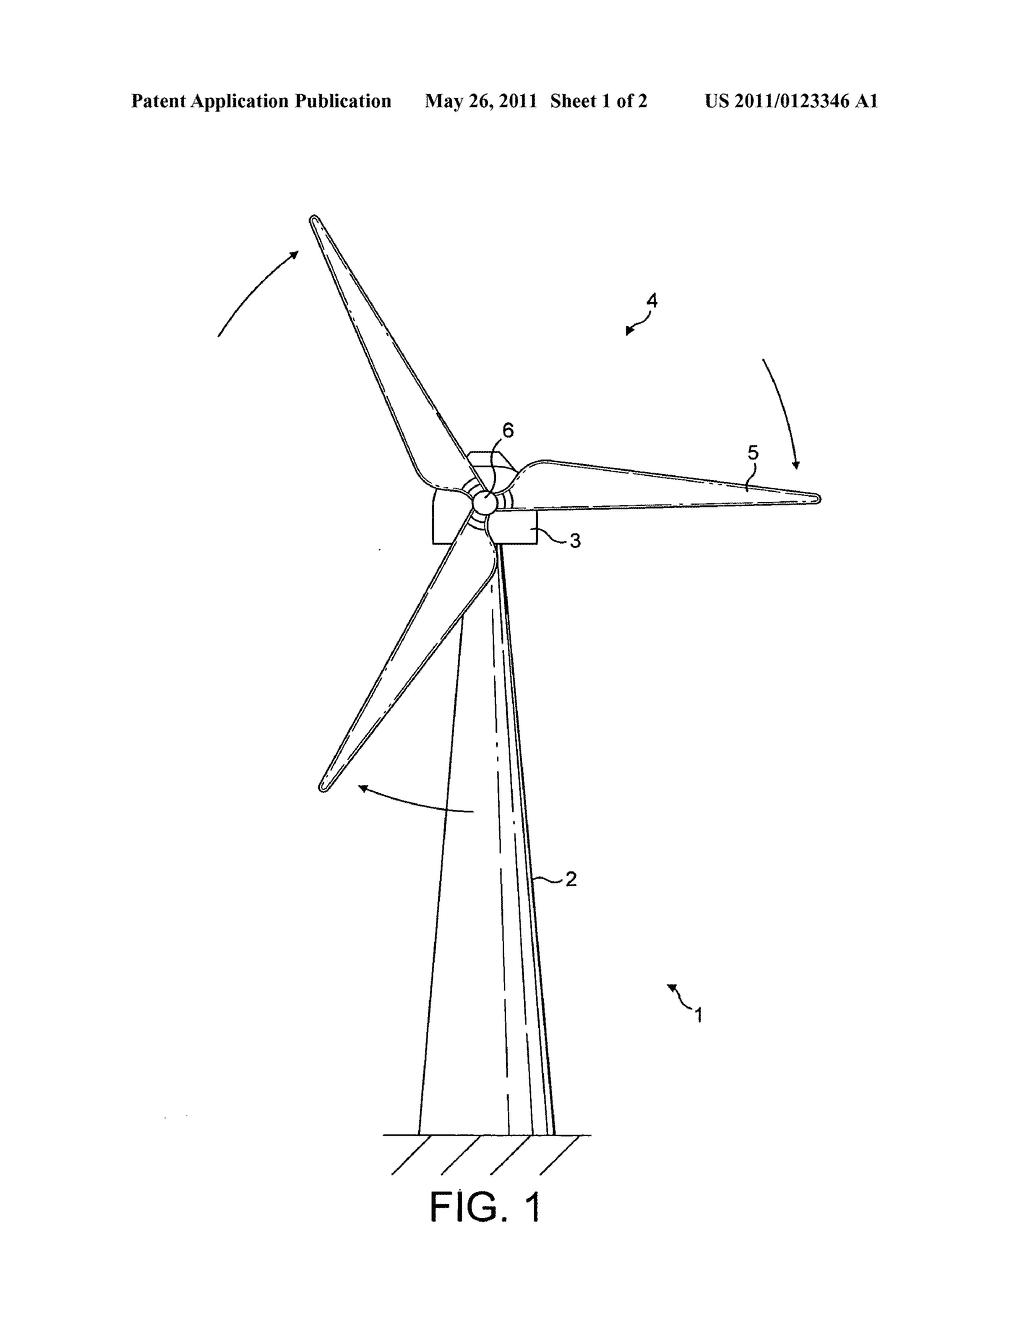 hight resolution of wind turbine blade diagram schematic and image 02 diagram of wind turbine blades